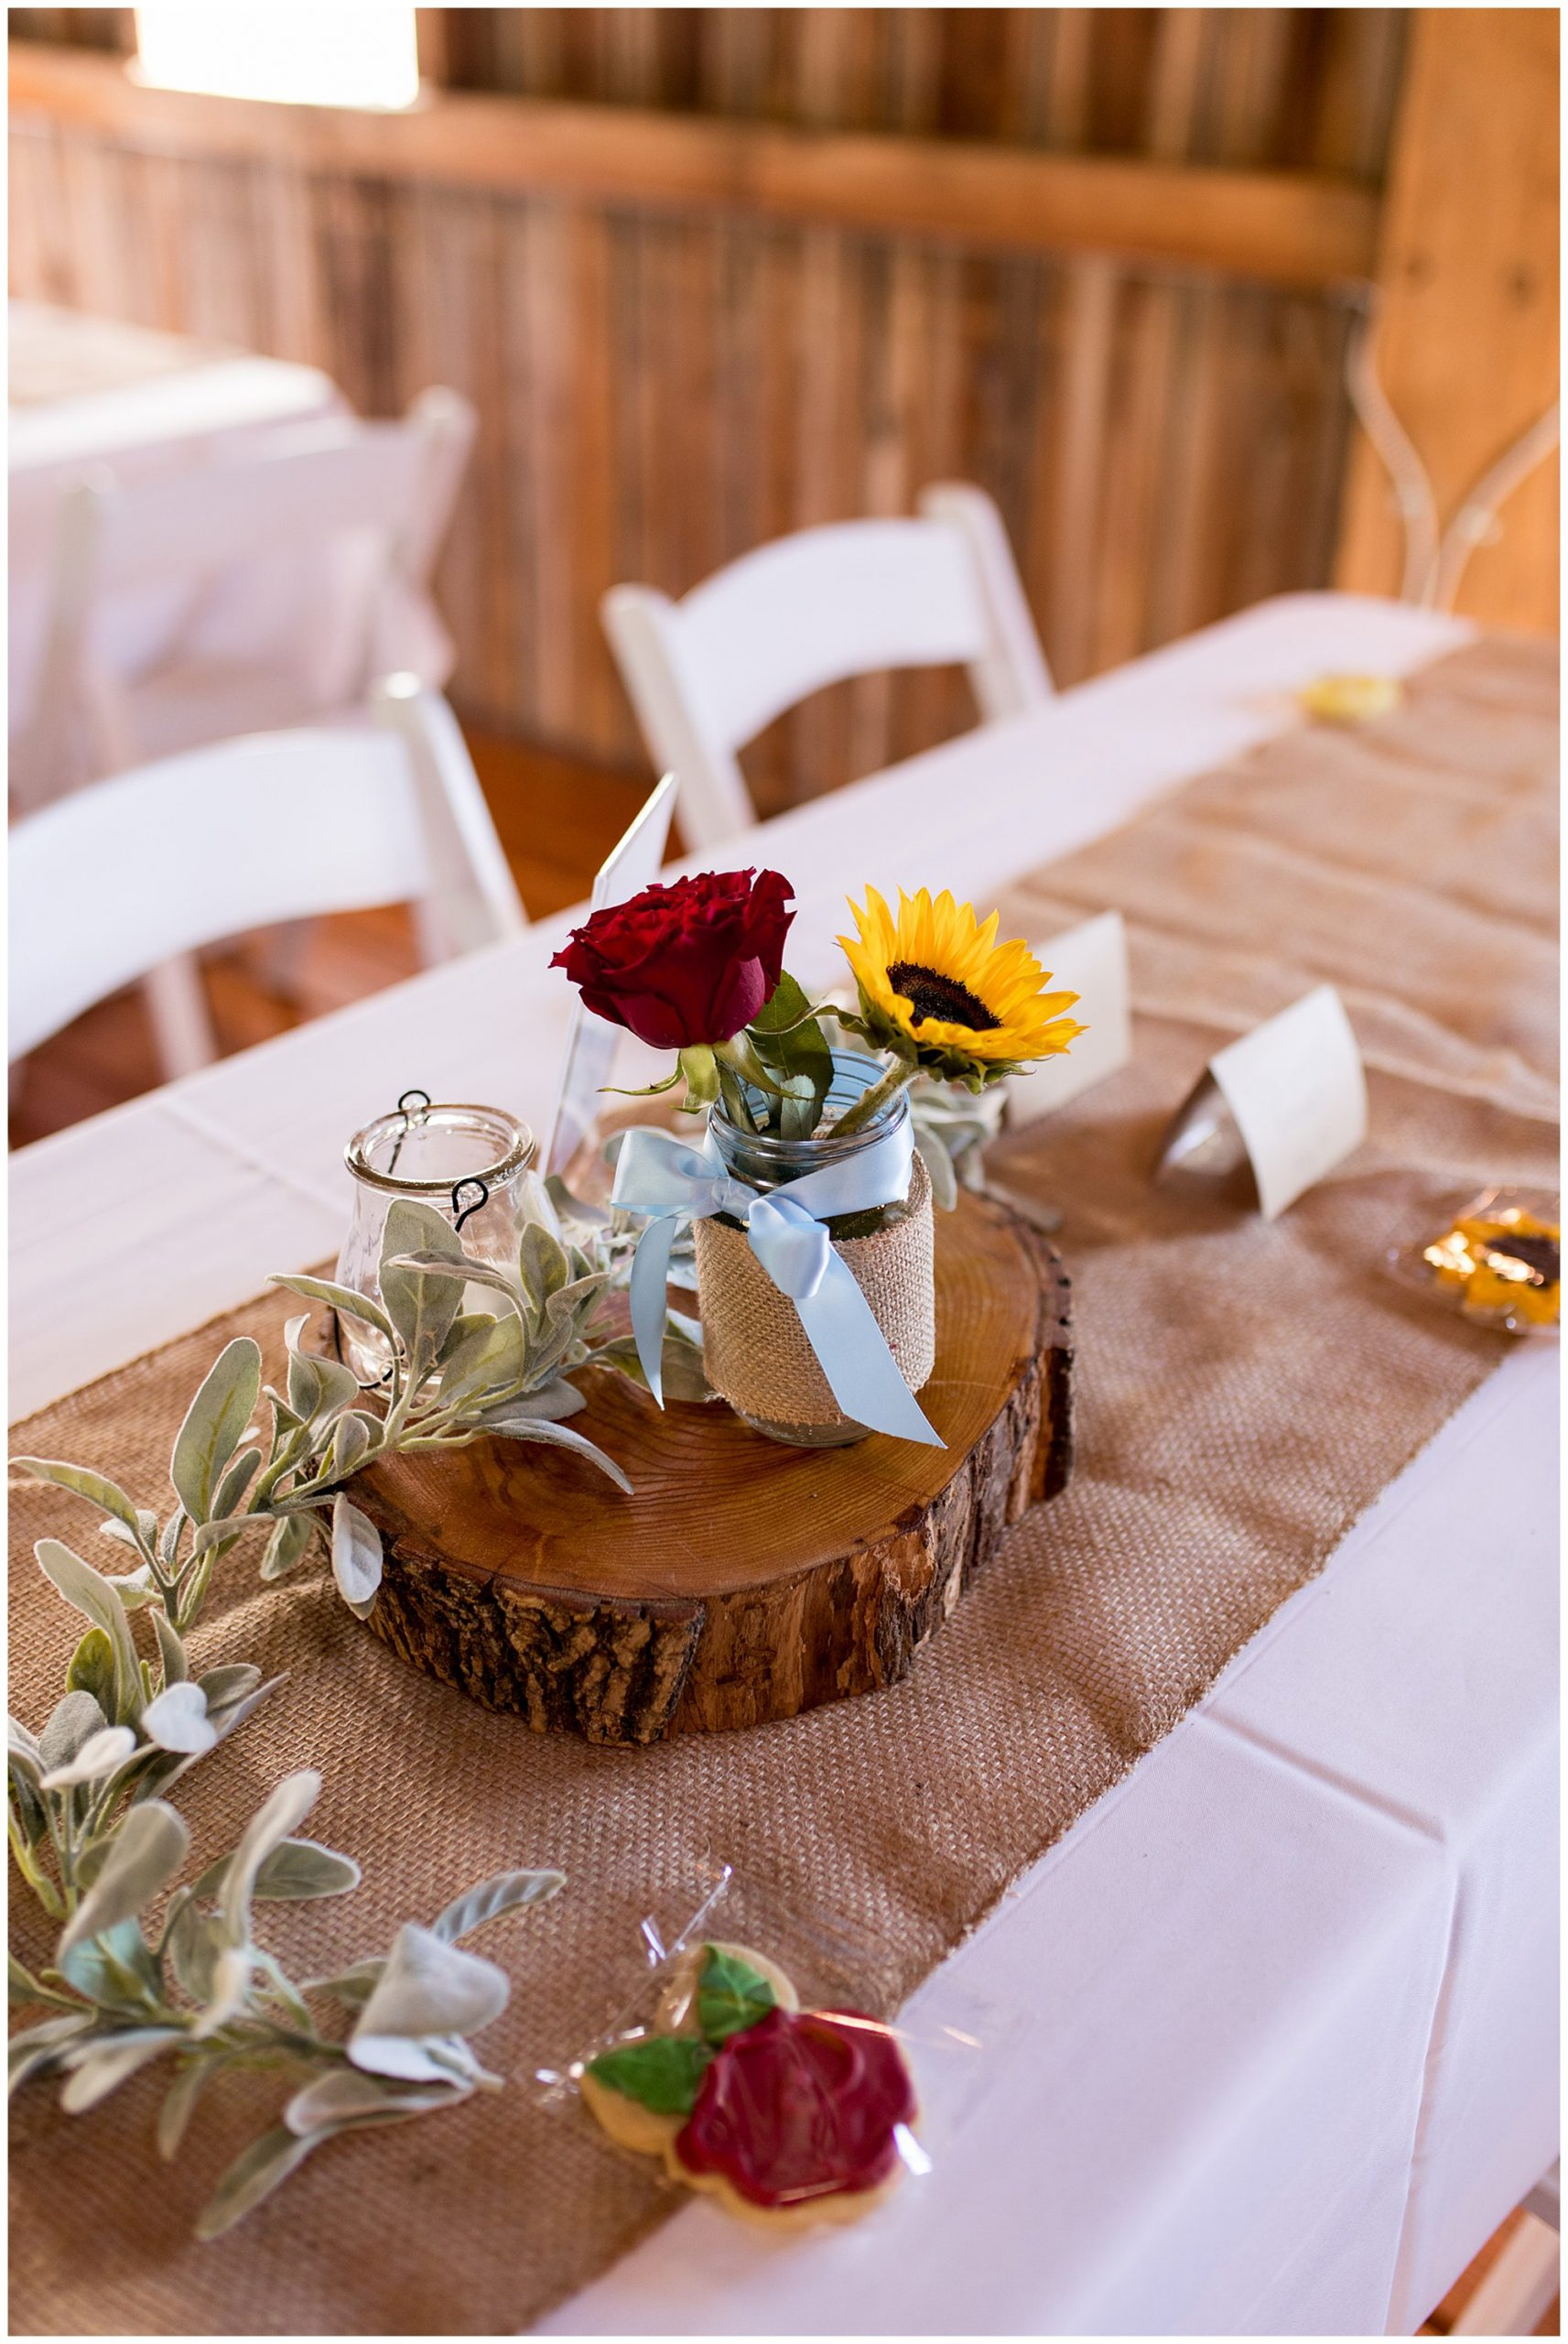 Legacy Barn wedding reception decor in Kokomo Indiana